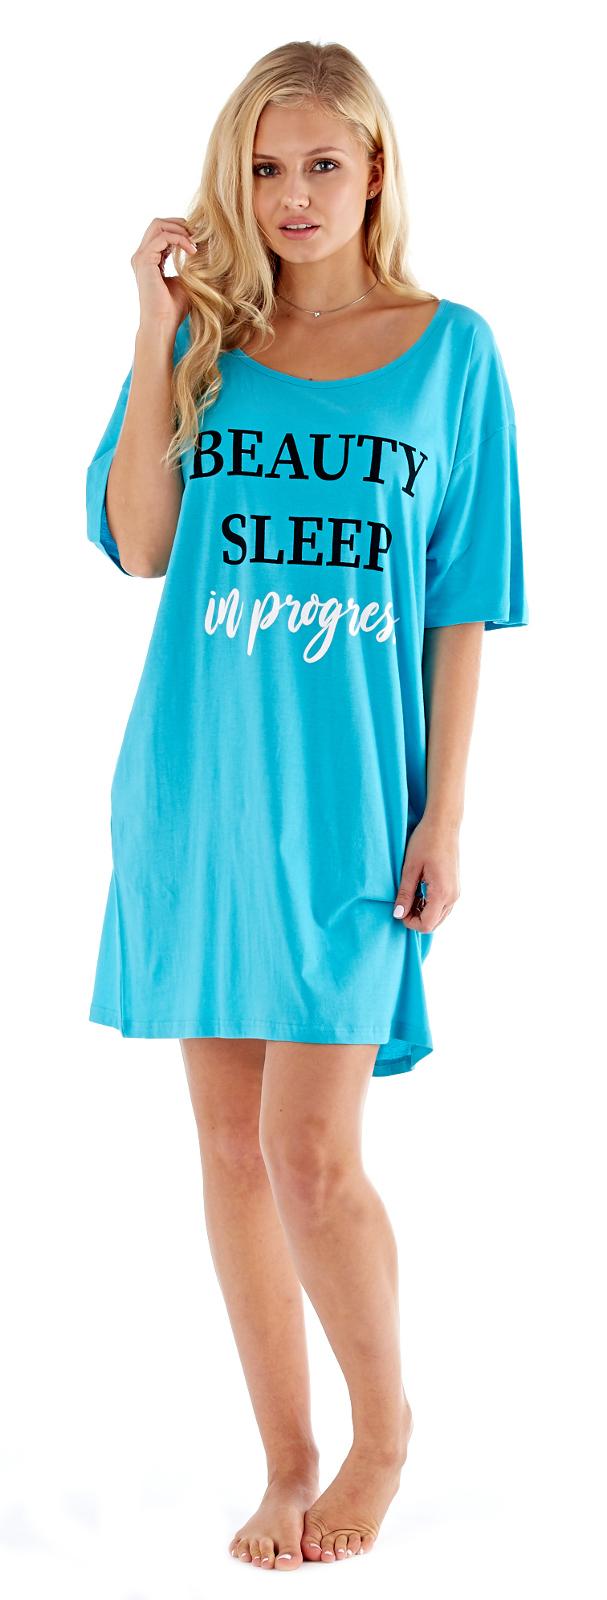 LADIES//WOMENS FUN PRINT//SLOGAN NIGHT SHIRT NIGHTDRESS NIGHTIE NIGHTSHIRT